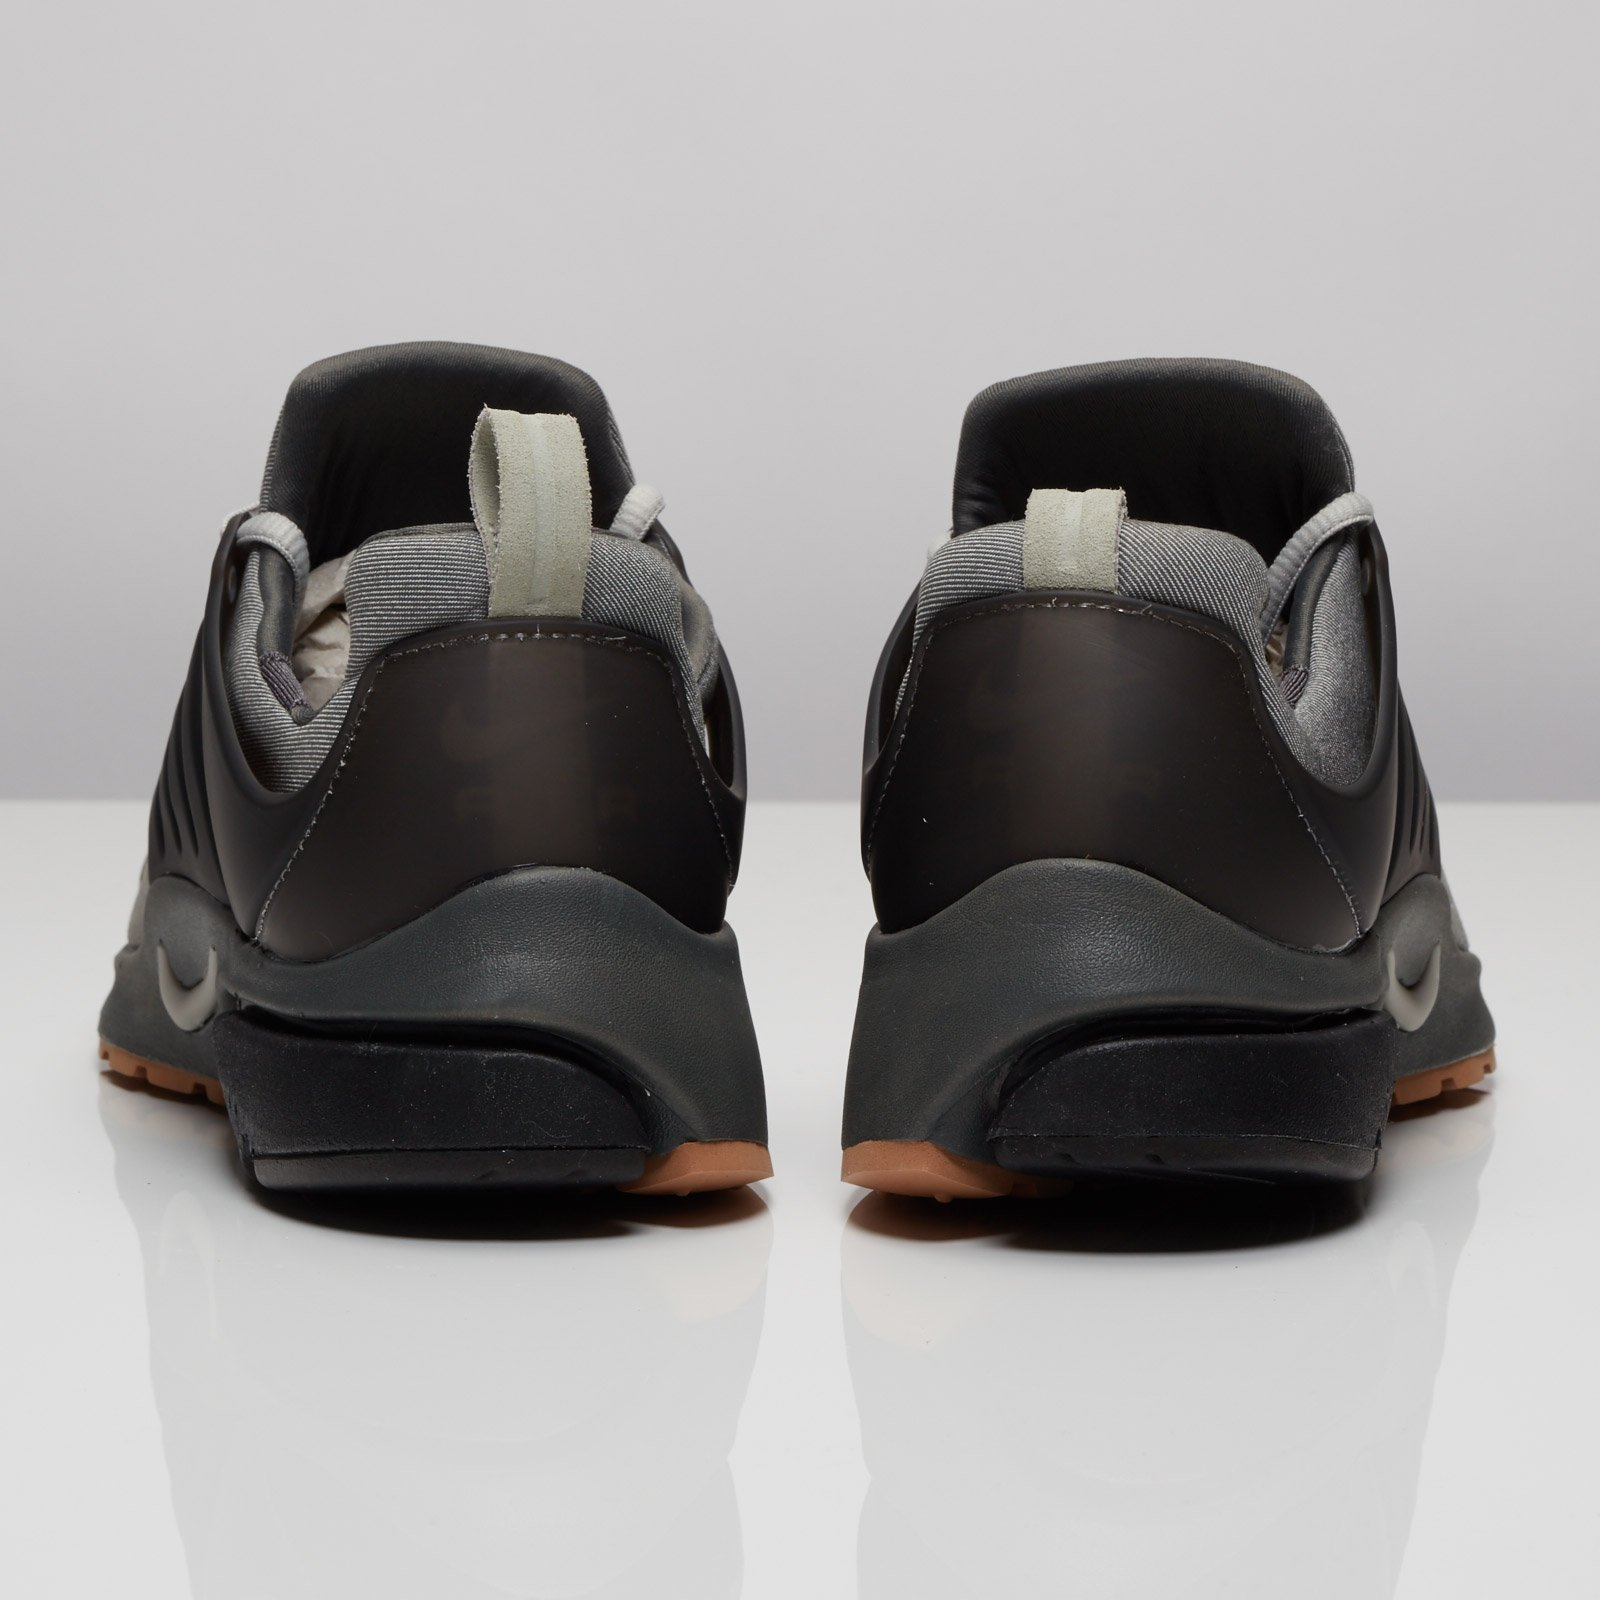 sale retailer 4b4be 35042 Nike Air Presto Premium Nike Air Presto Premium ...